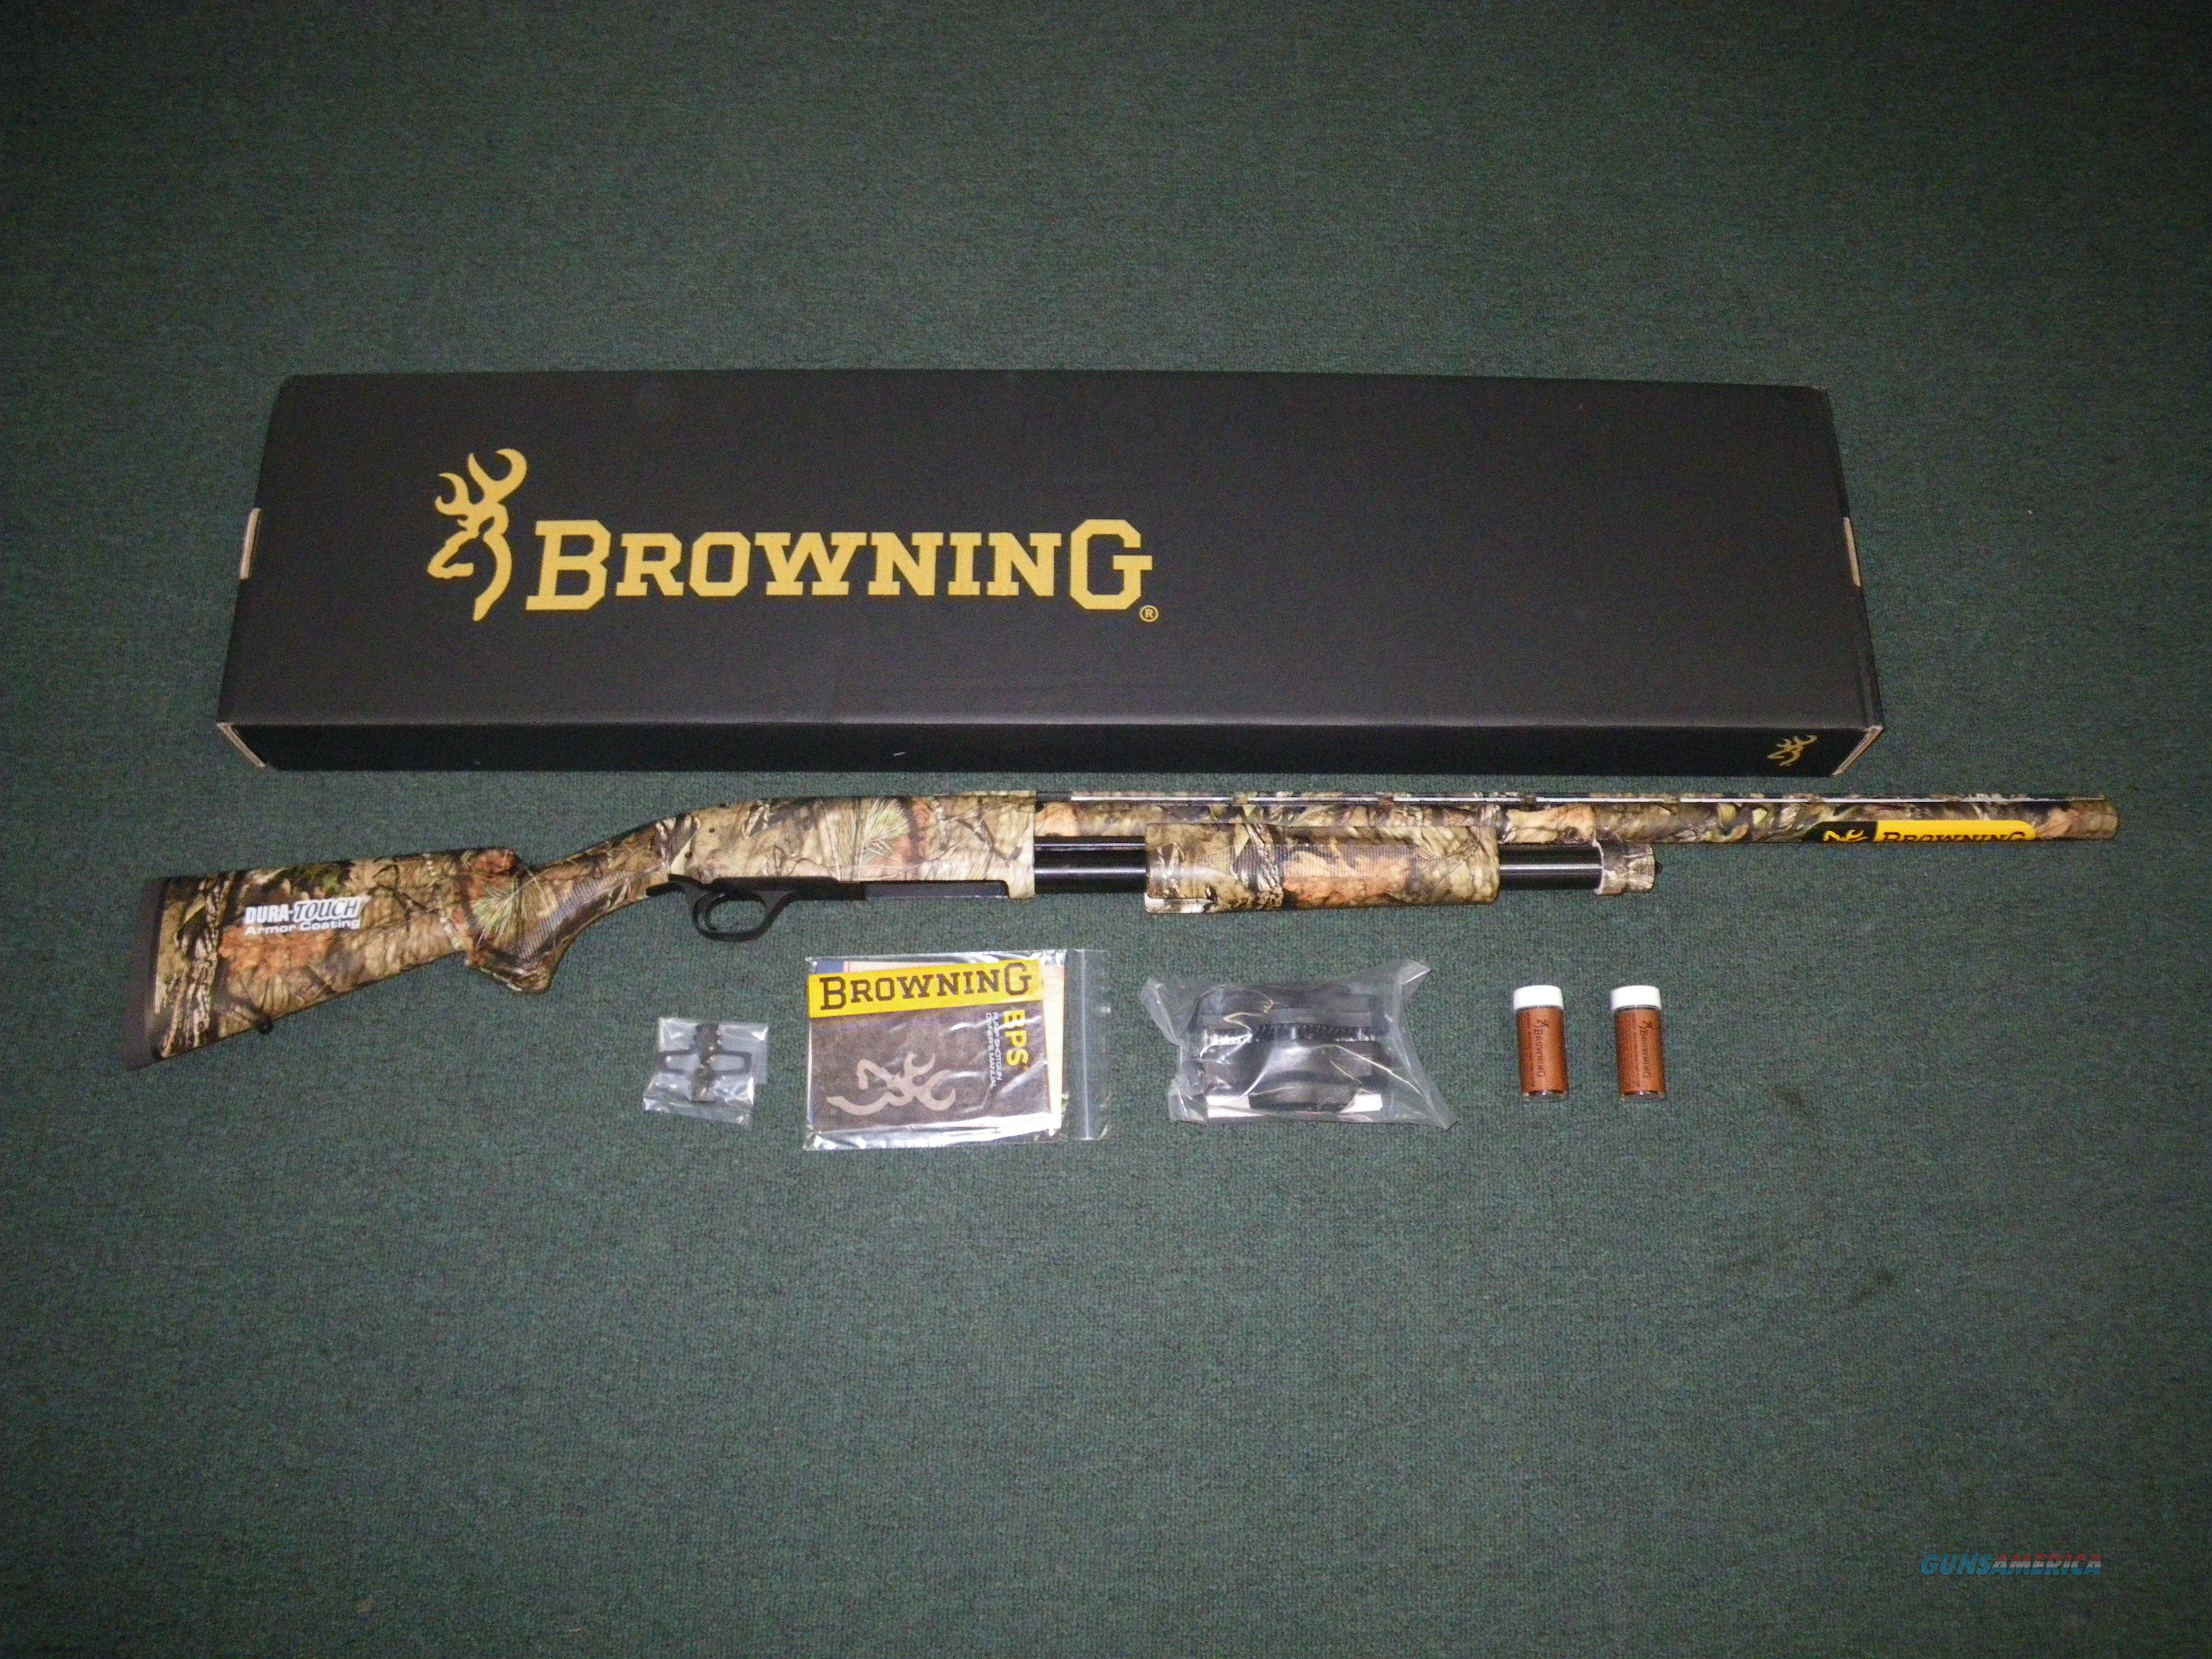 "Browning BPS Mossy Oak Break-Up Cntry 12ga 26"" NEW #012279205  Guns > Shotguns > Browning Shotguns > Pump Action > Hunting"